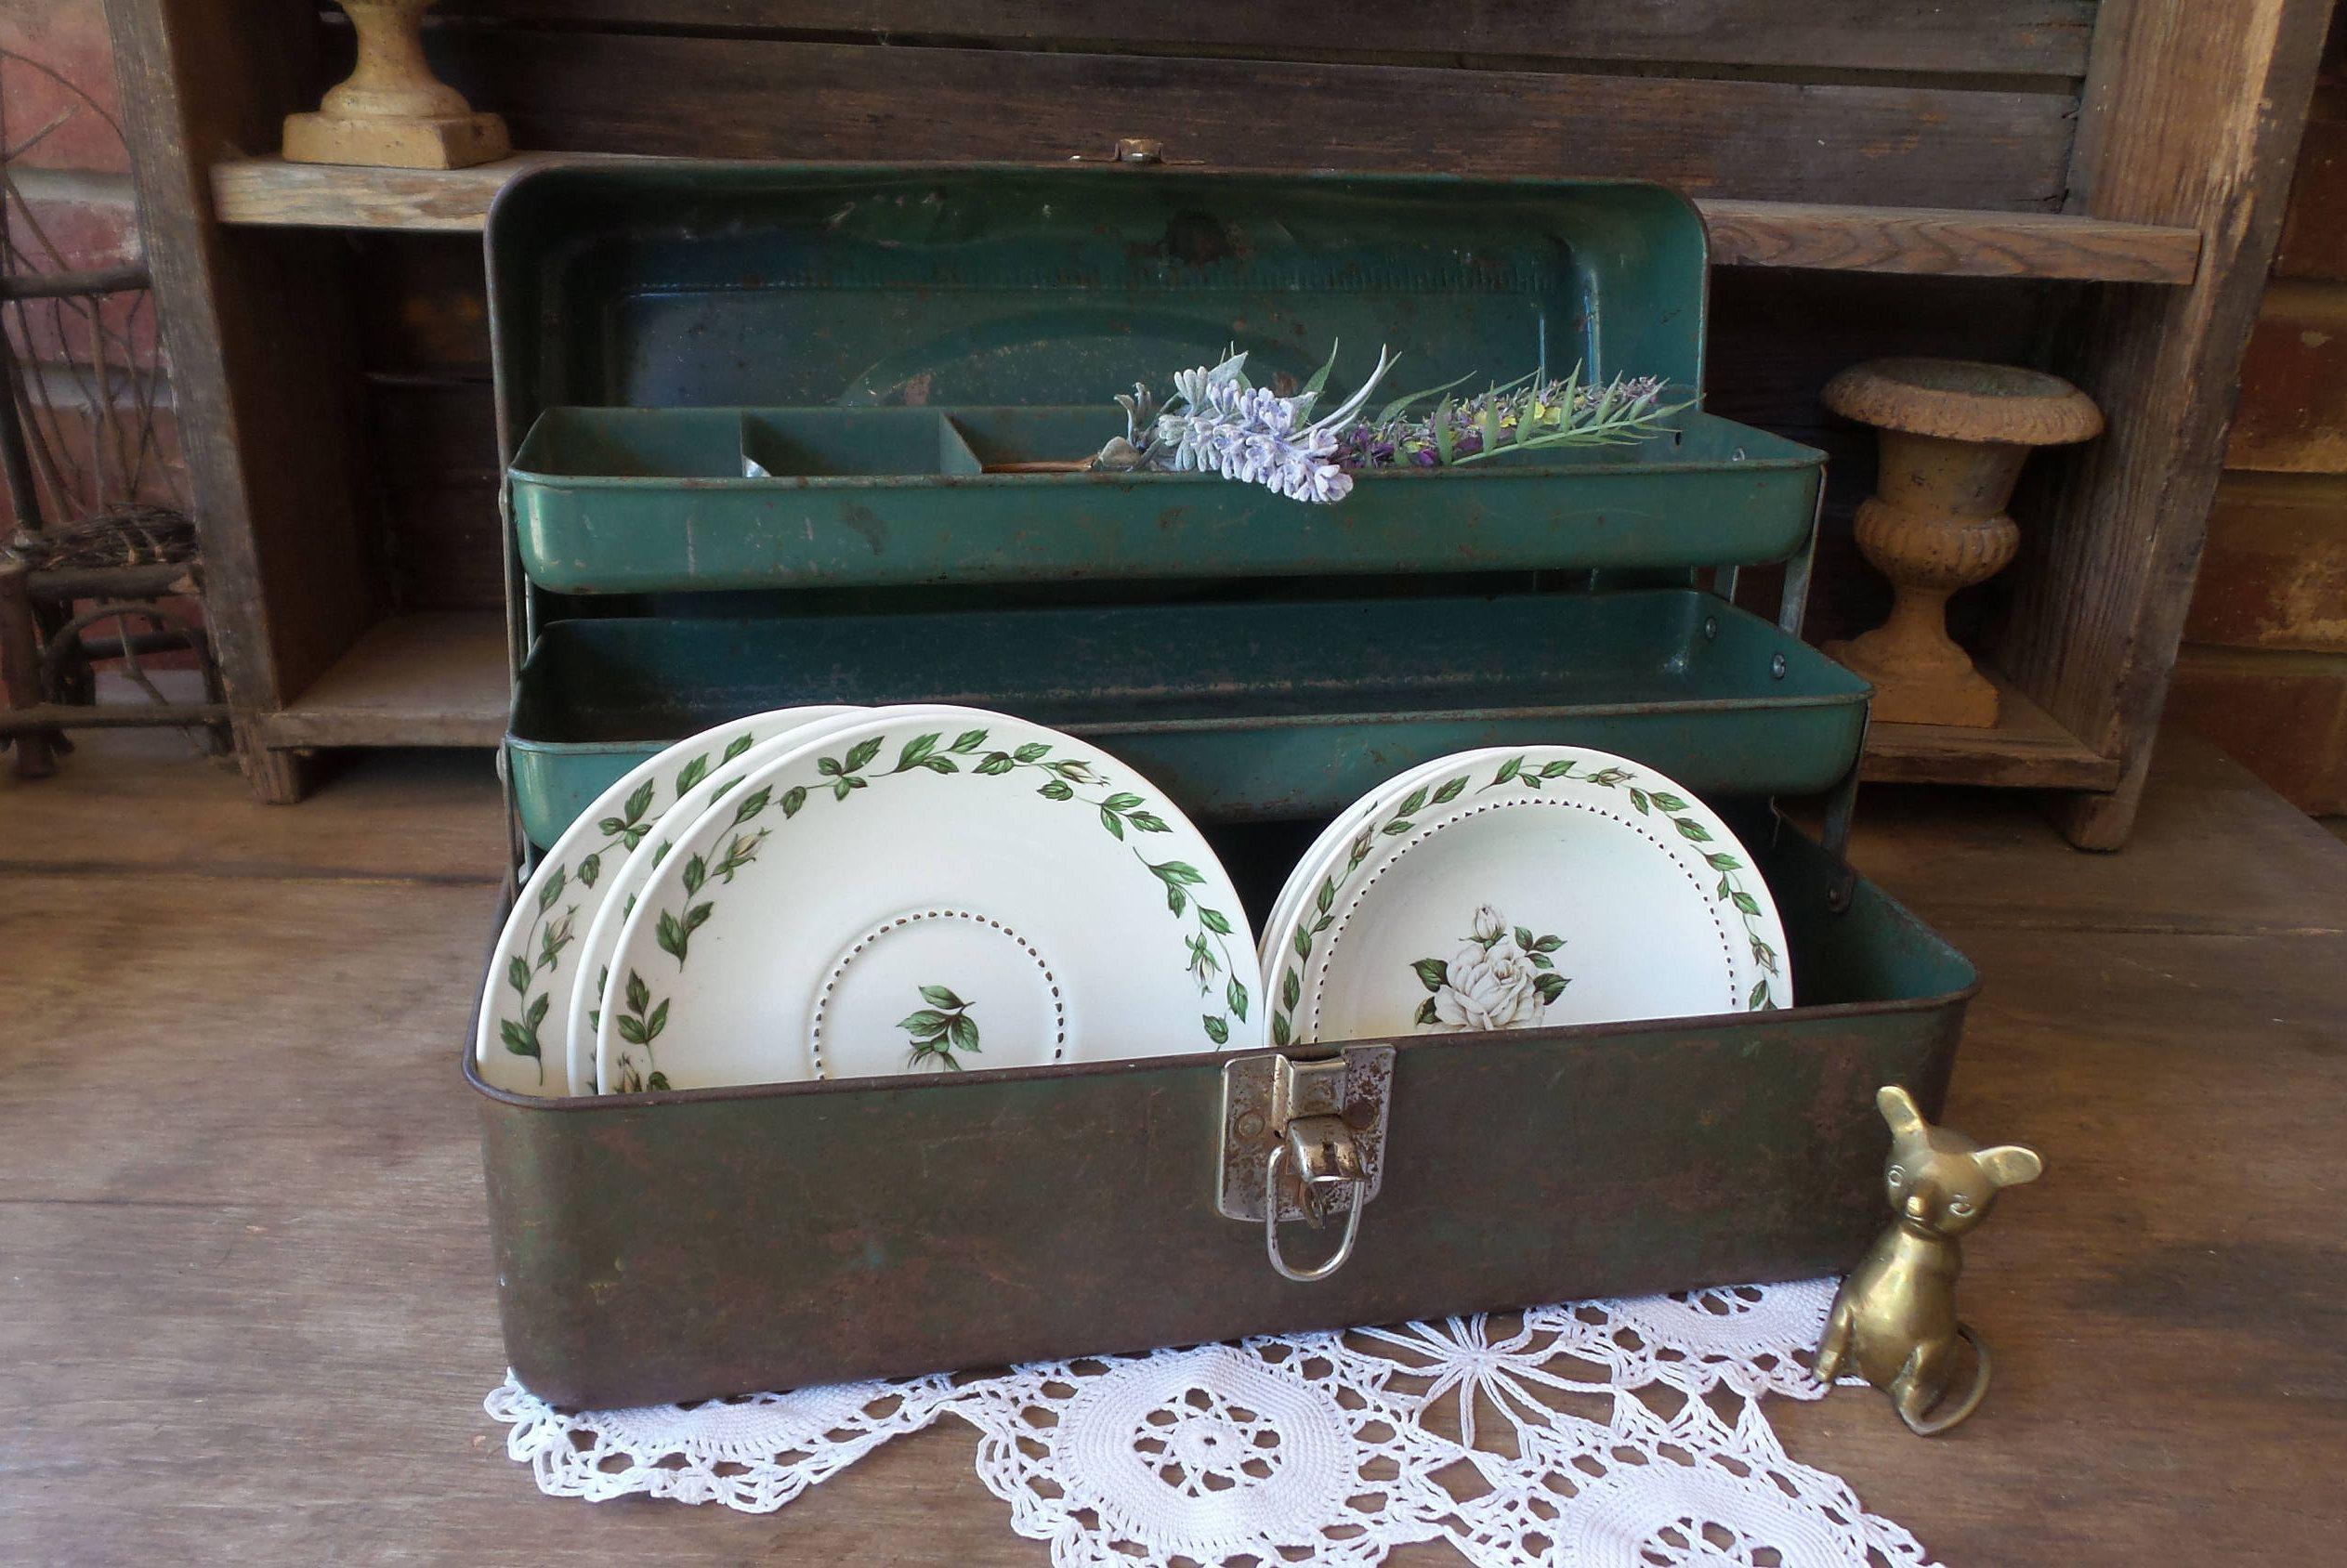 Fishing tackle craft supplies - Vintage Fishing Tackle Box Vintage Metal Tool Box Industrial Vintage Metal Box Farm